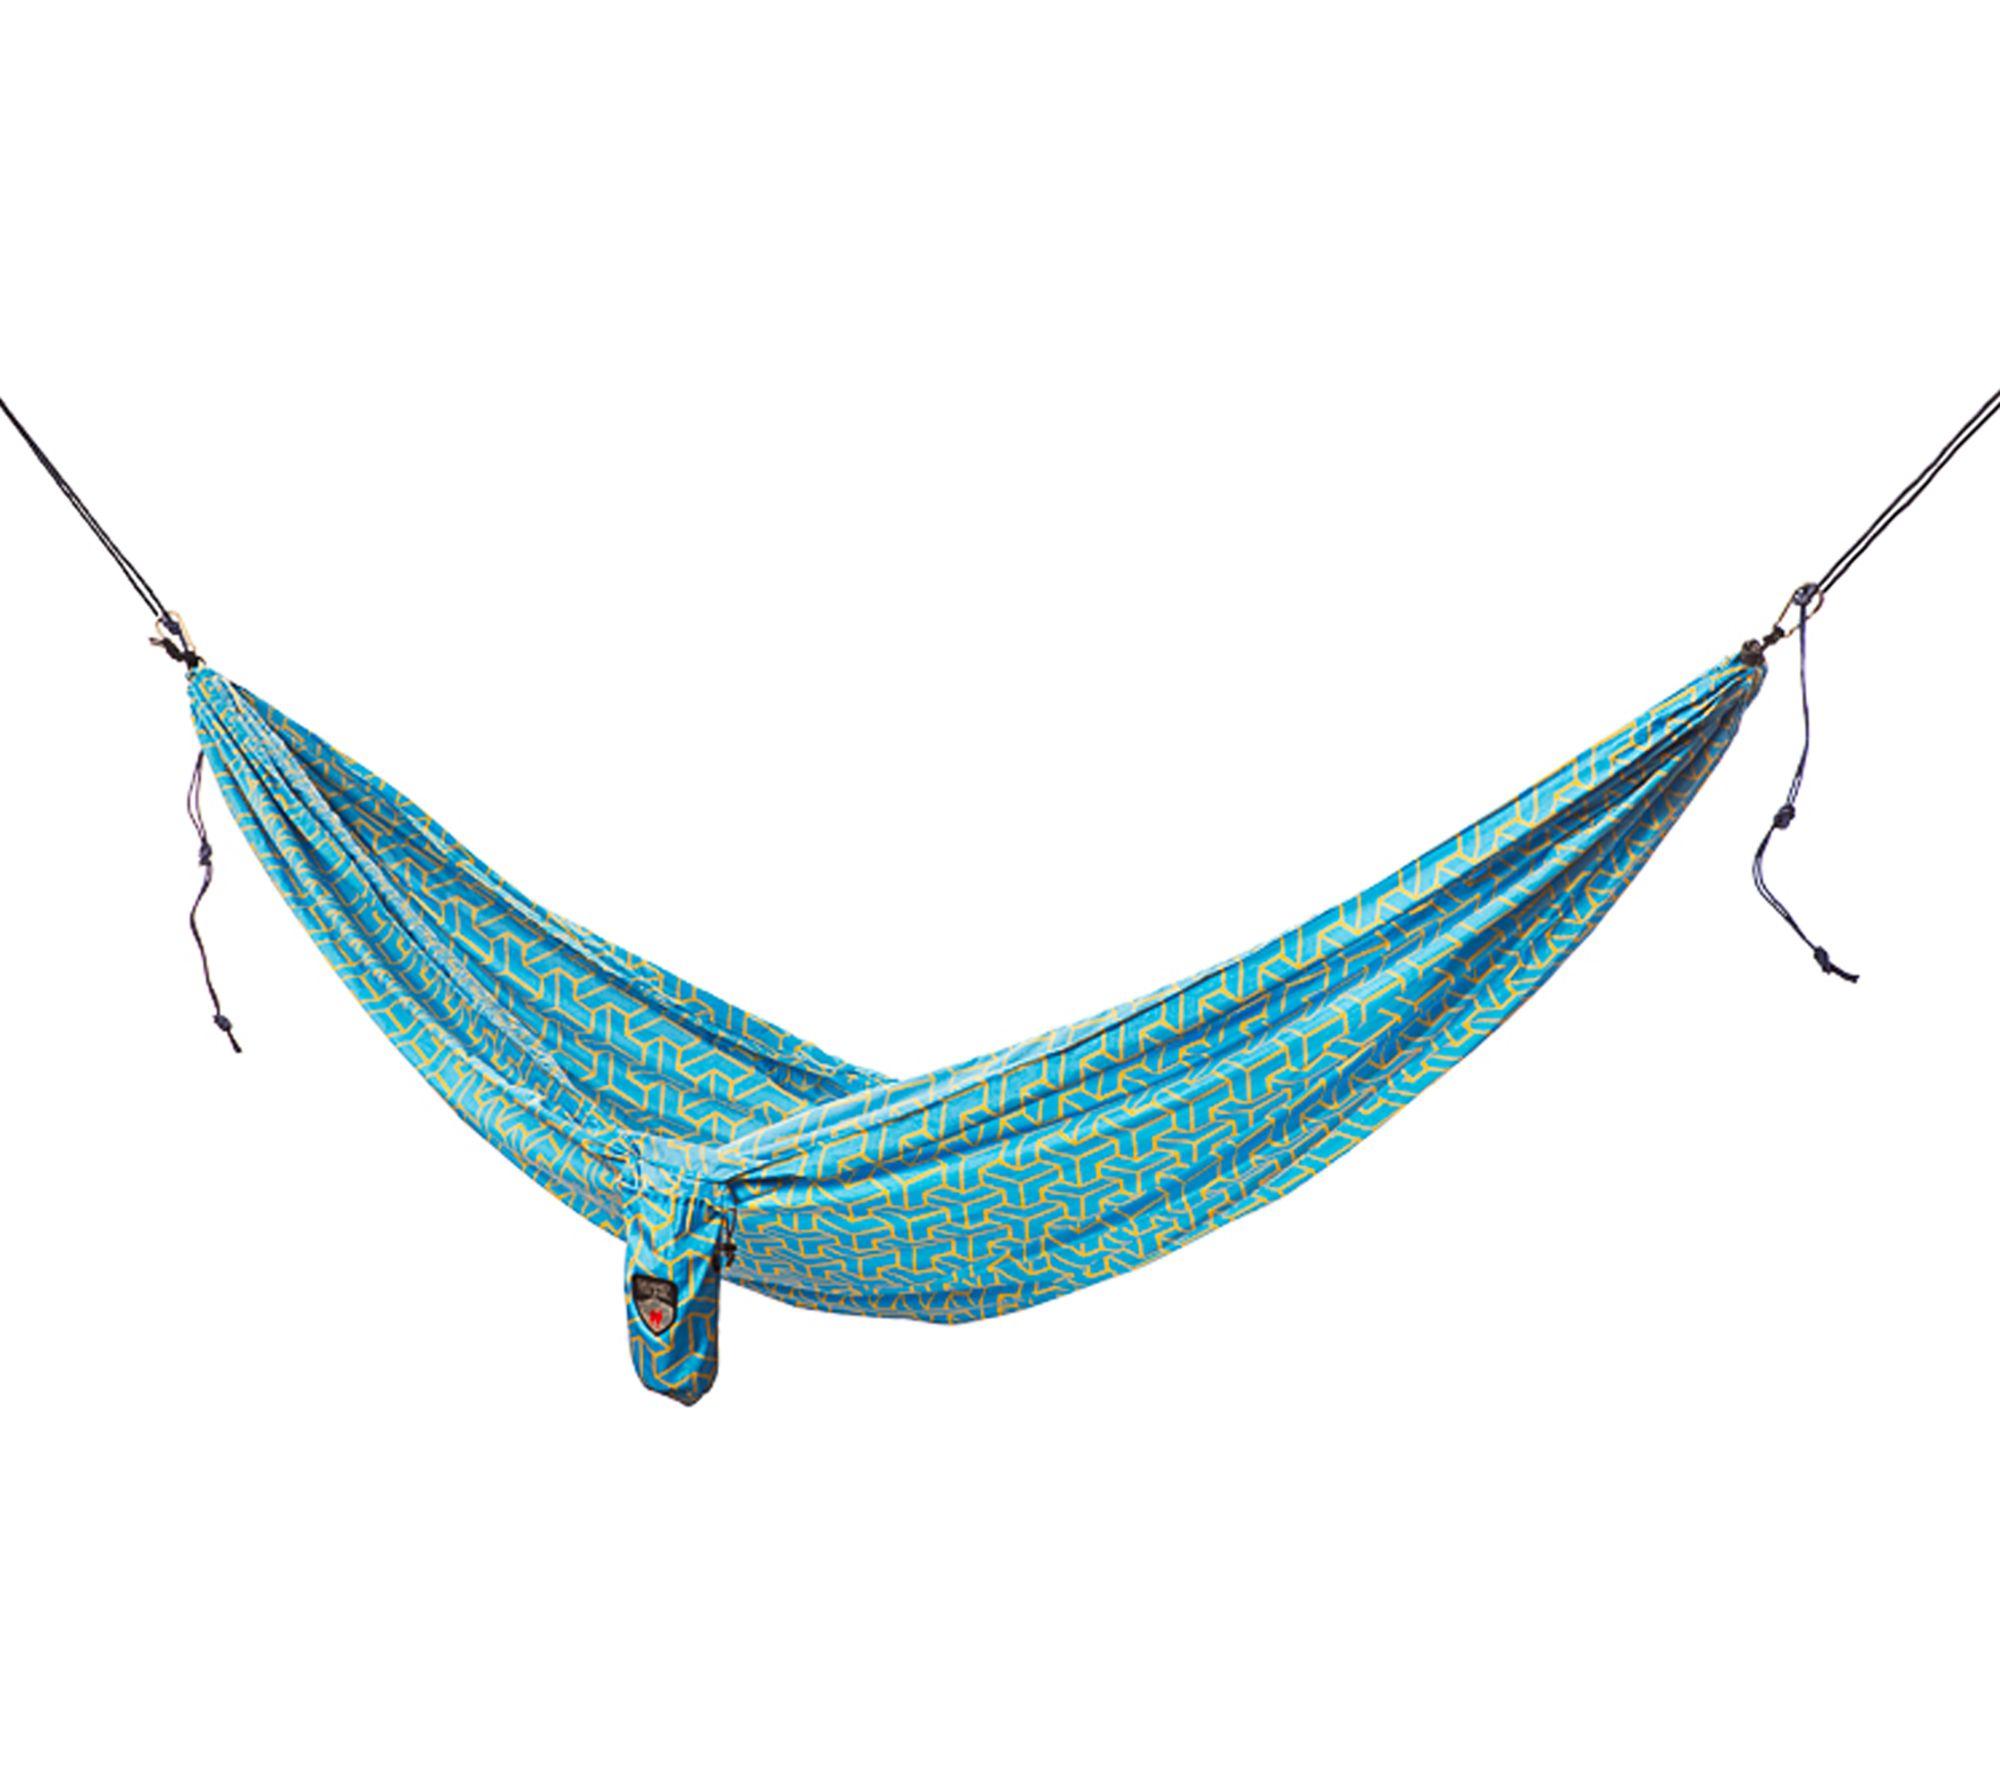 grand trunk double parachute nylon hammock prints yam one size   trunk deal dresses parachute nylon print double hammock   camping hammock  rh   pinterest